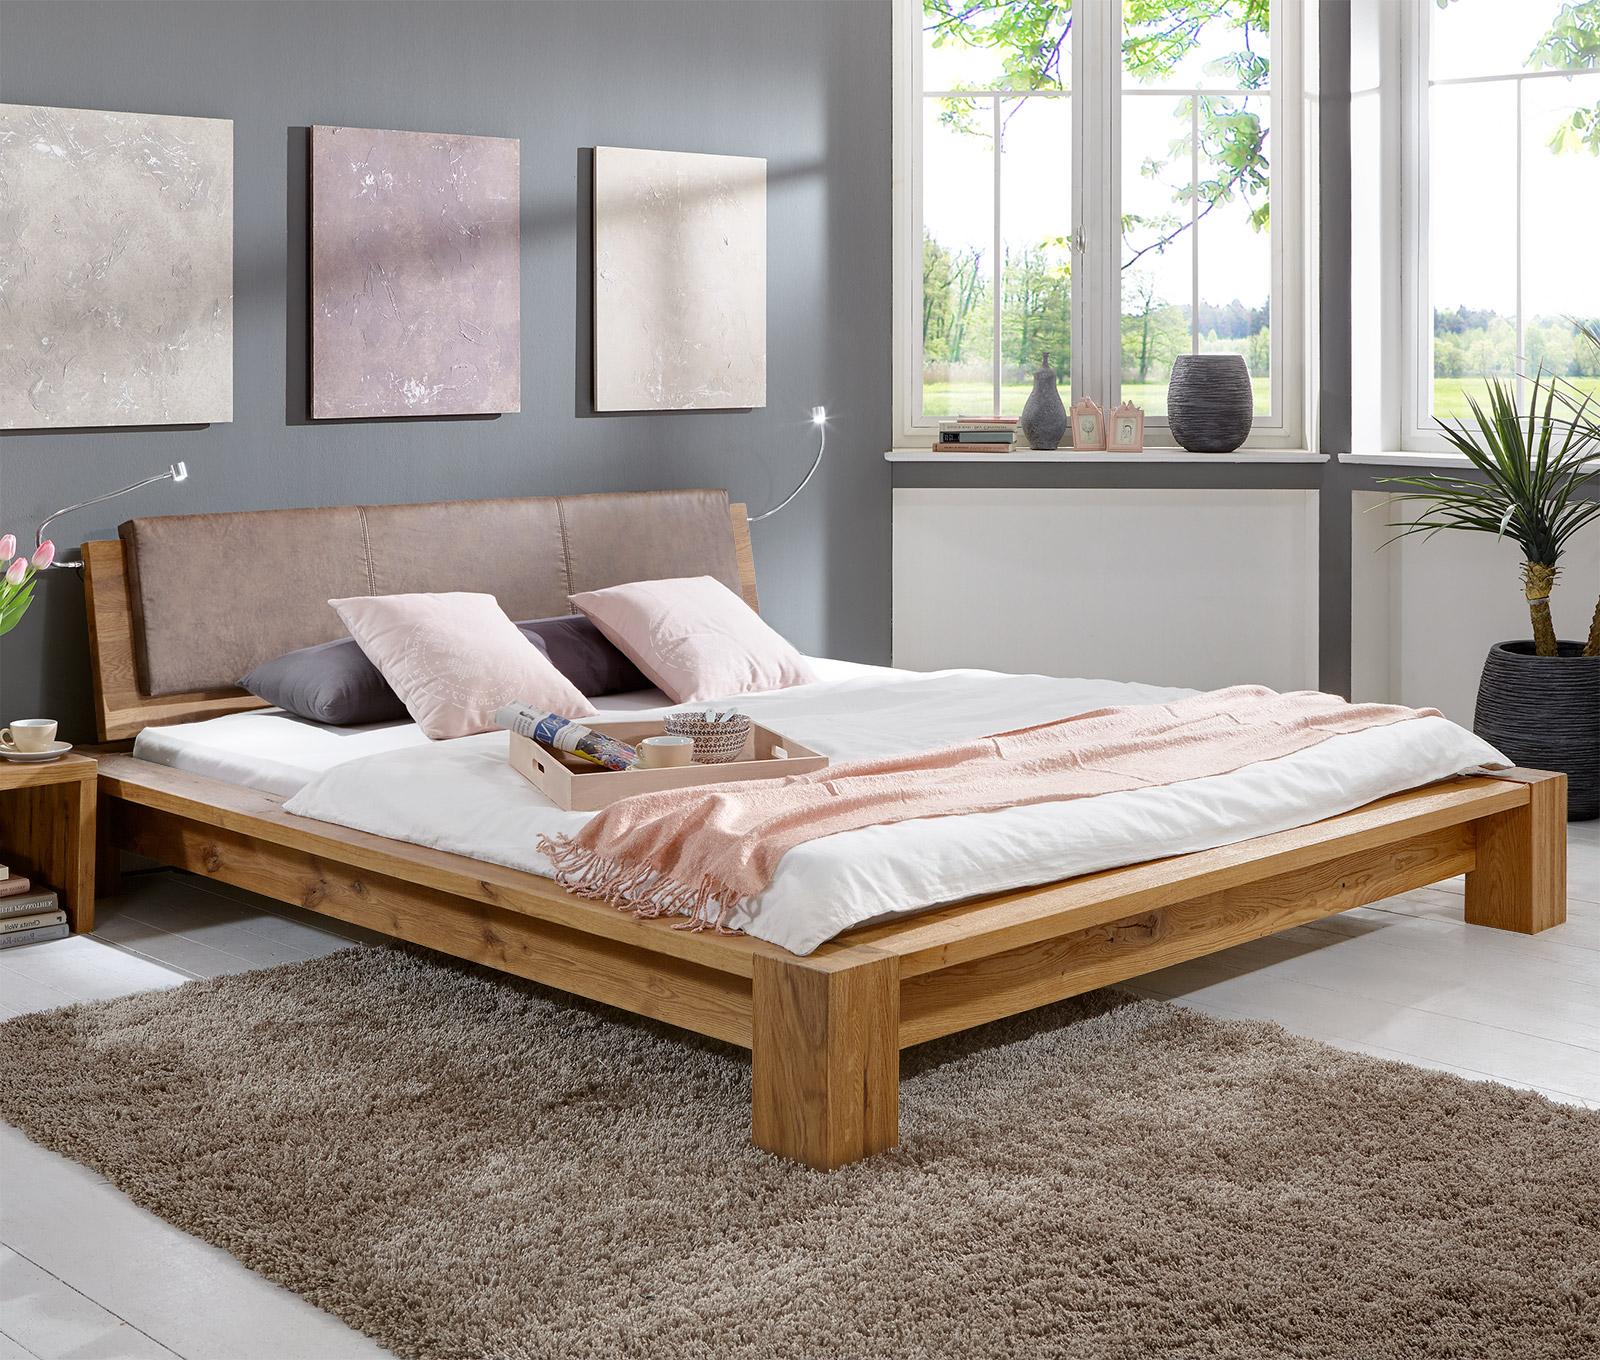 massivholz bett aus ge lter wildeiche z b 180x200 domingo. Black Bedroom Furniture Sets. Home Design Ideas